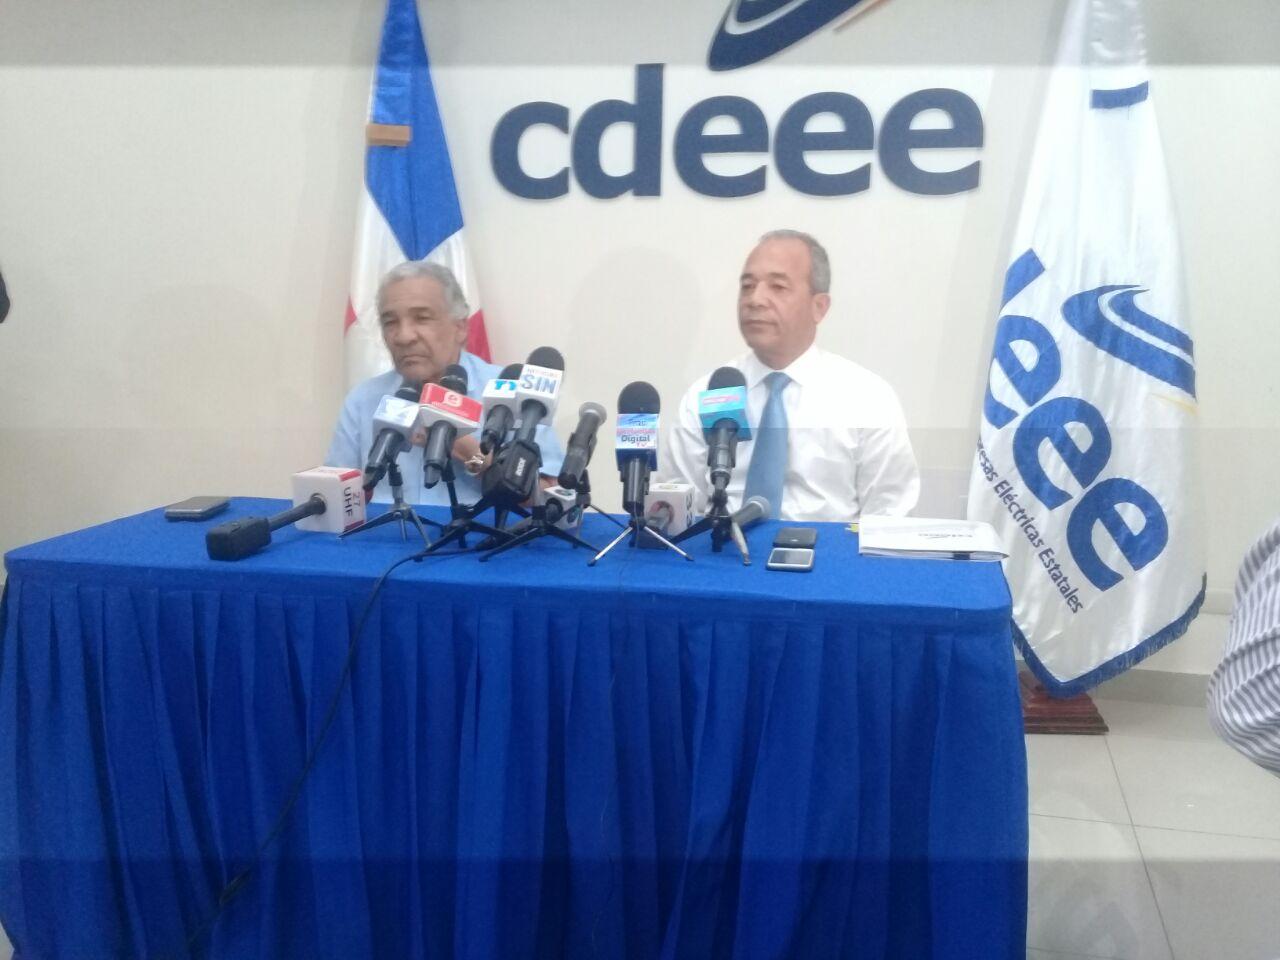 CDEEE aclara no ha firmado acuerdo con empresa de capital Chino